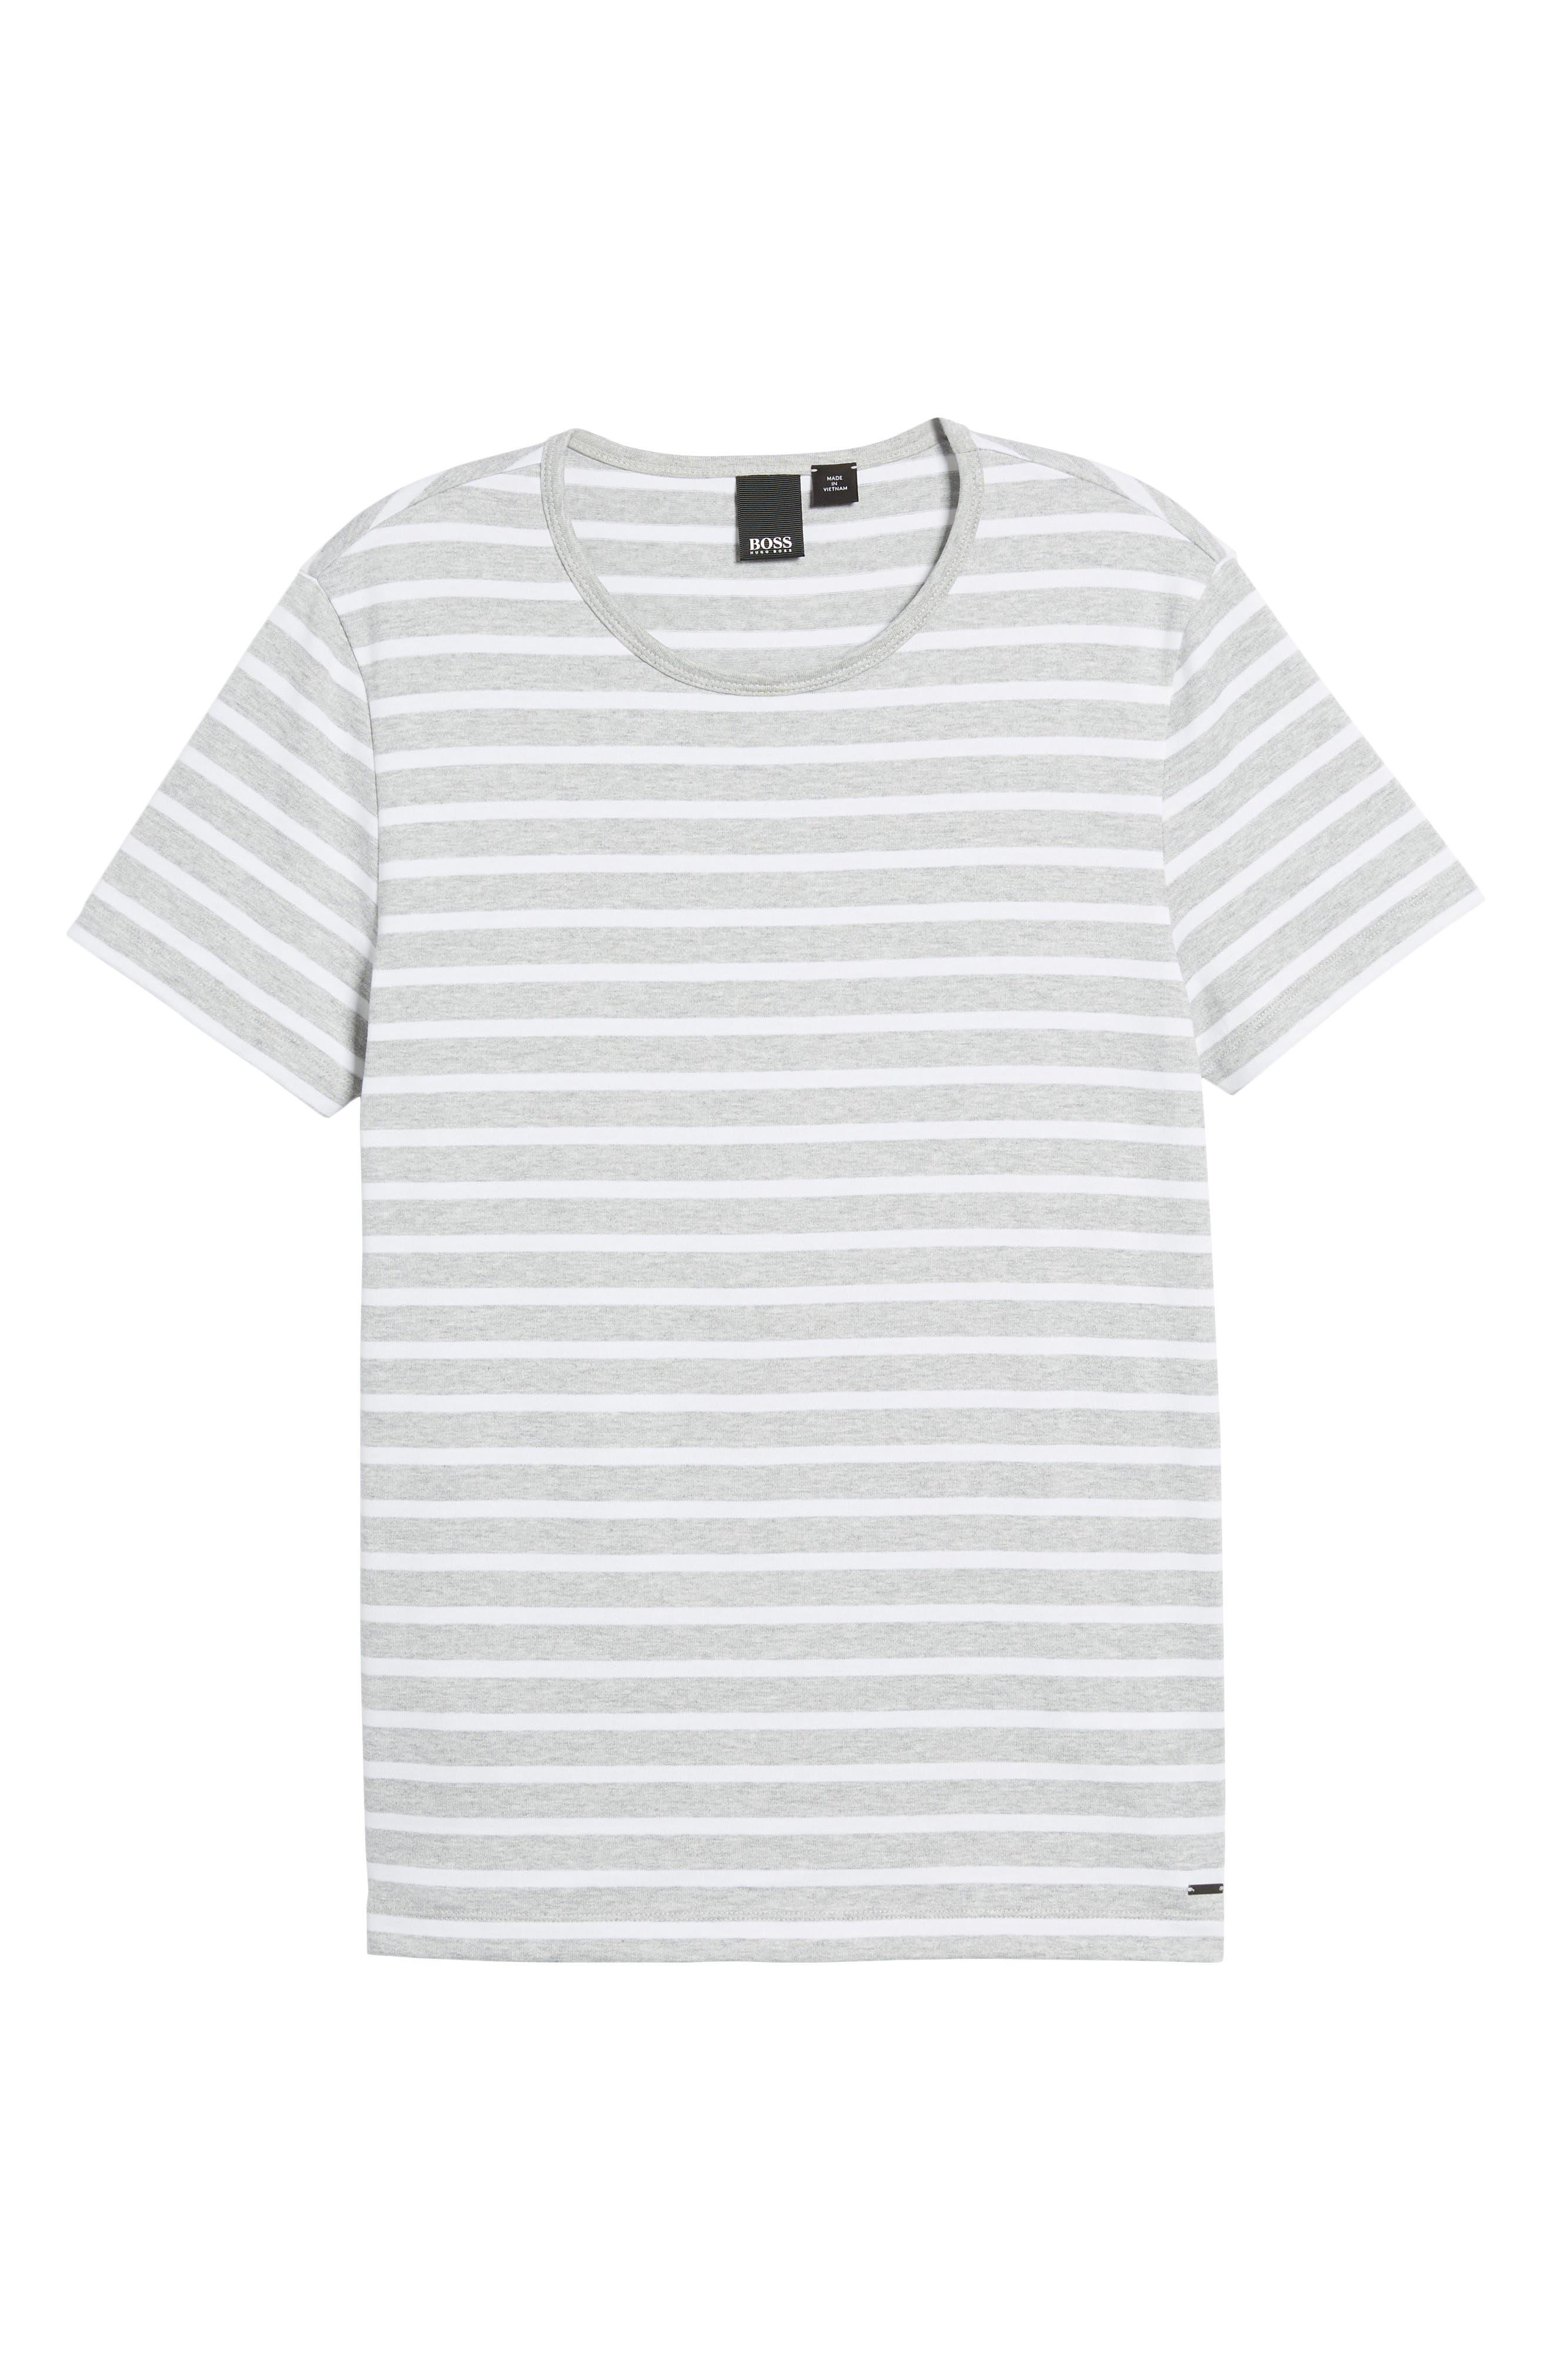 Tessler Slim Fit Crewneck T-Shirt,                             Alternate thumbnail 6, color,                             Grey